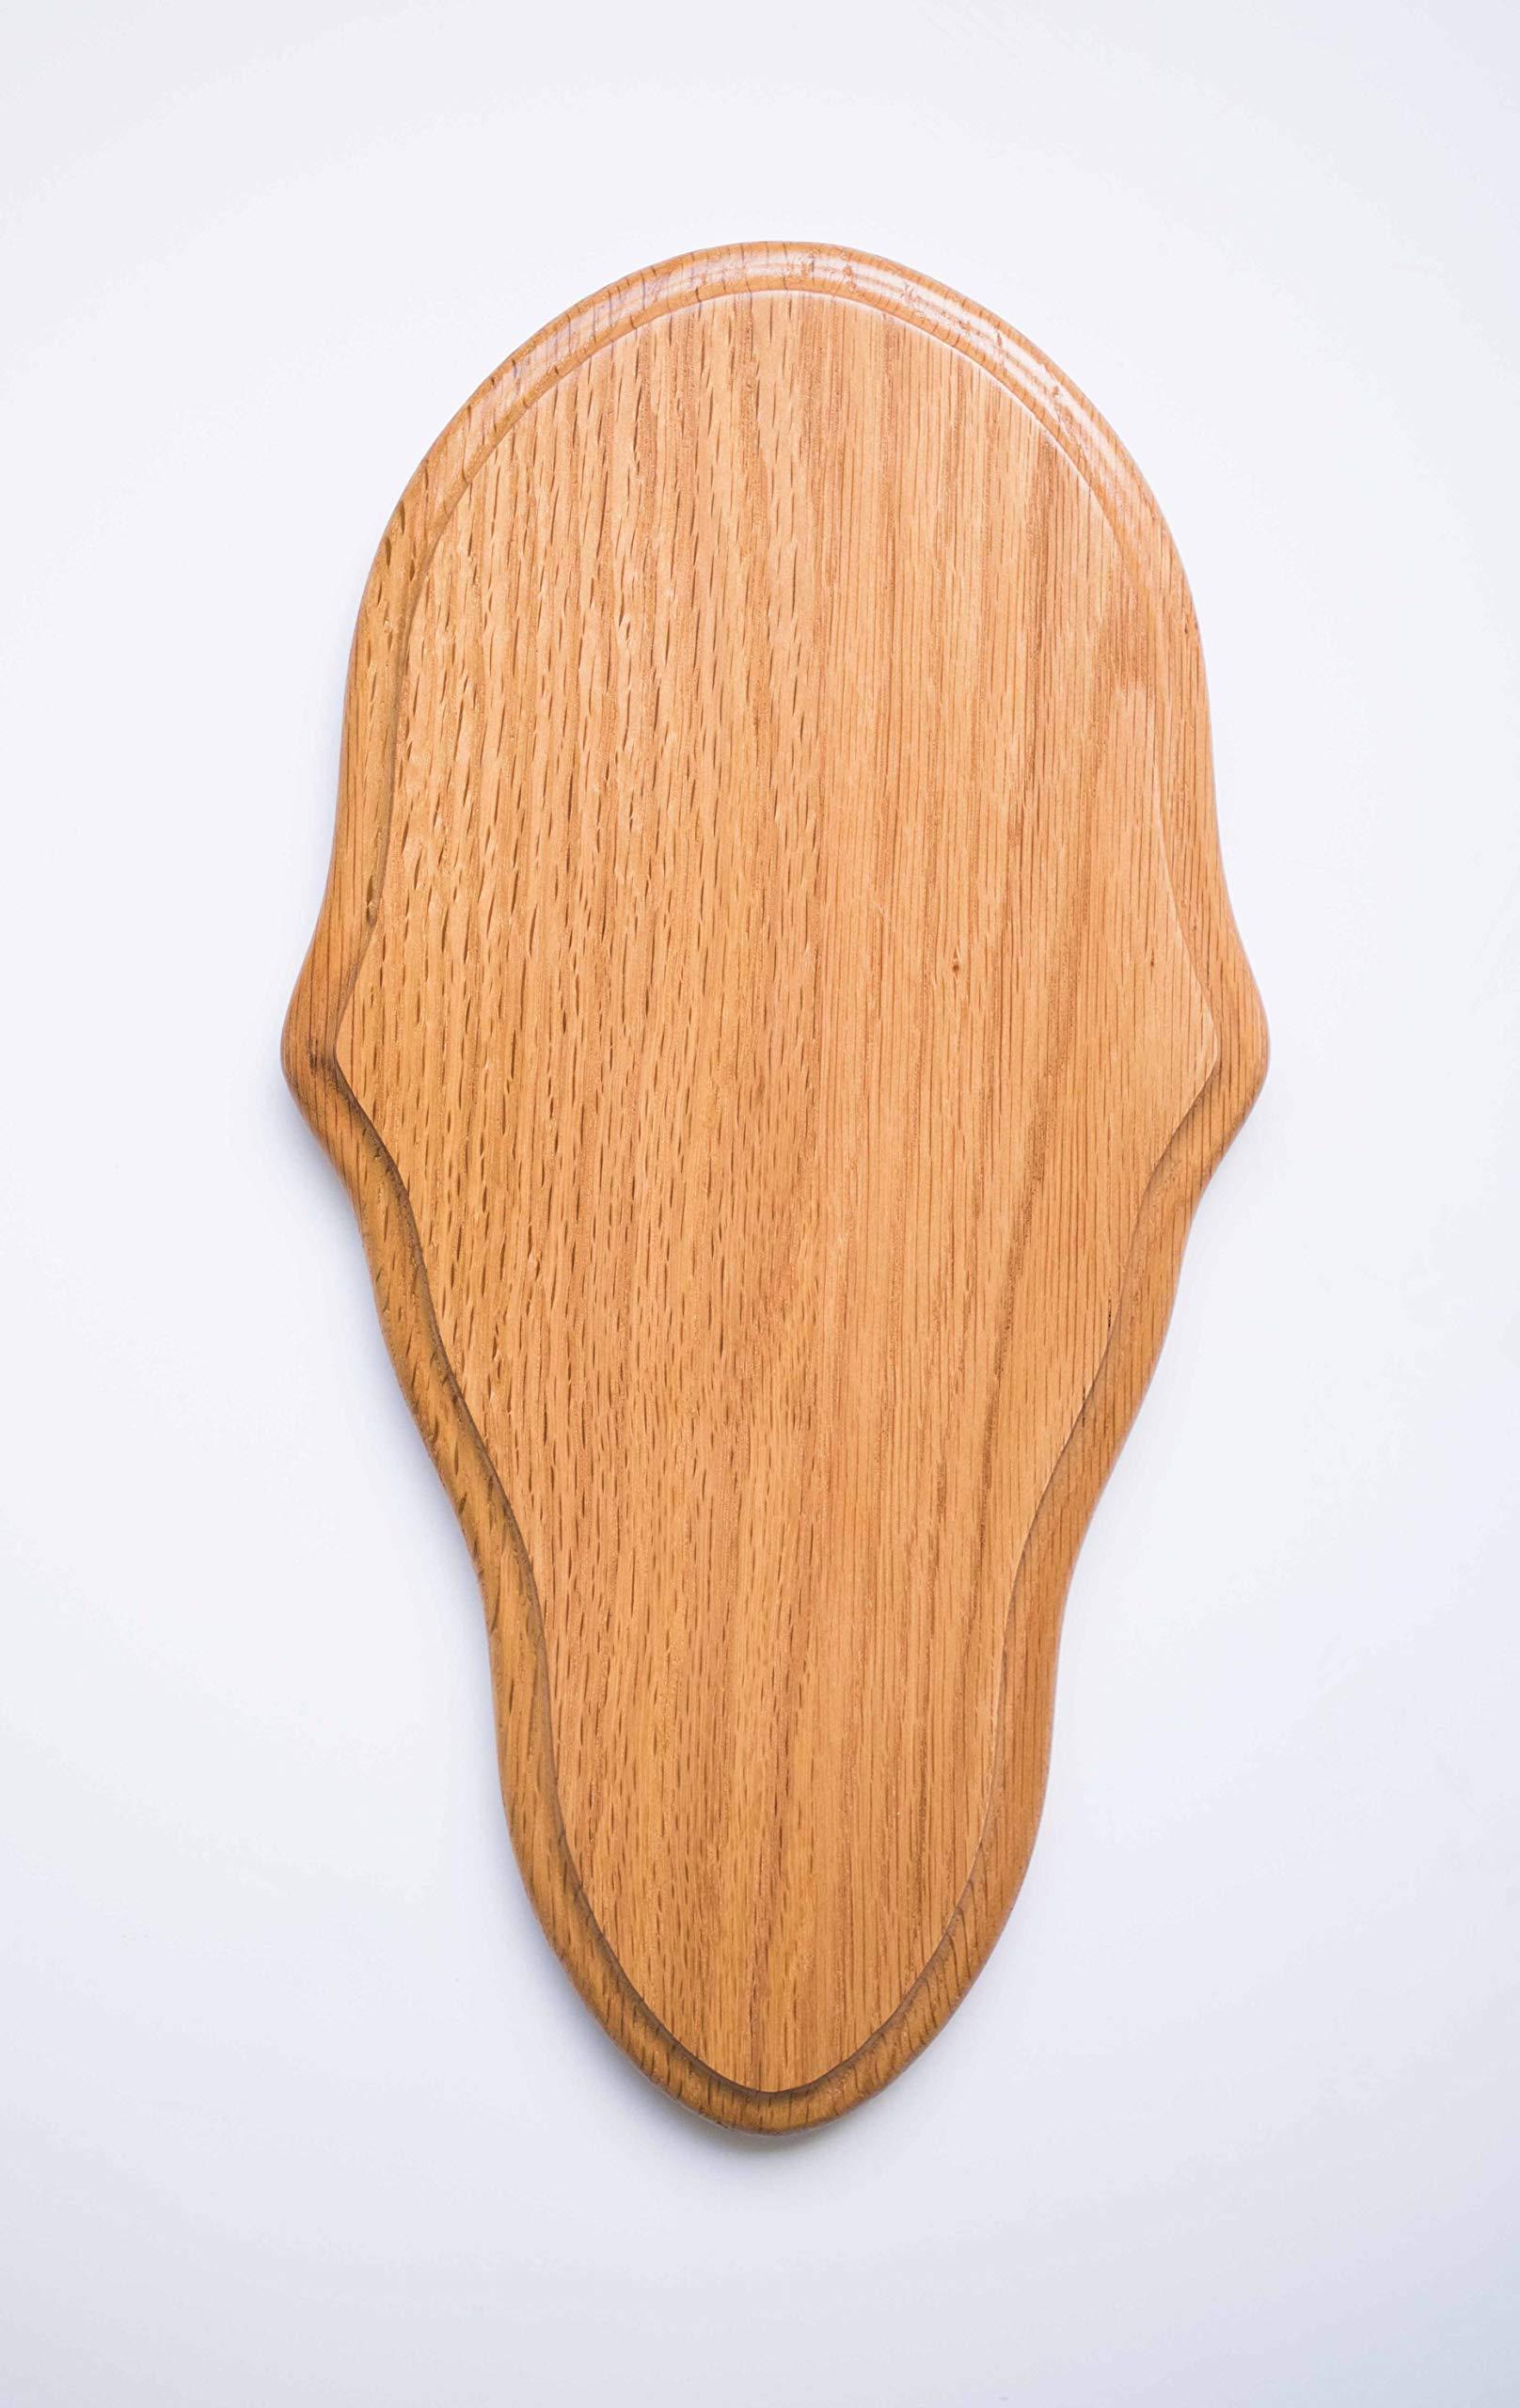 Taxidermists Woodshop Medium Oak Classic Deer European Skull Mount Face Plate Plaque